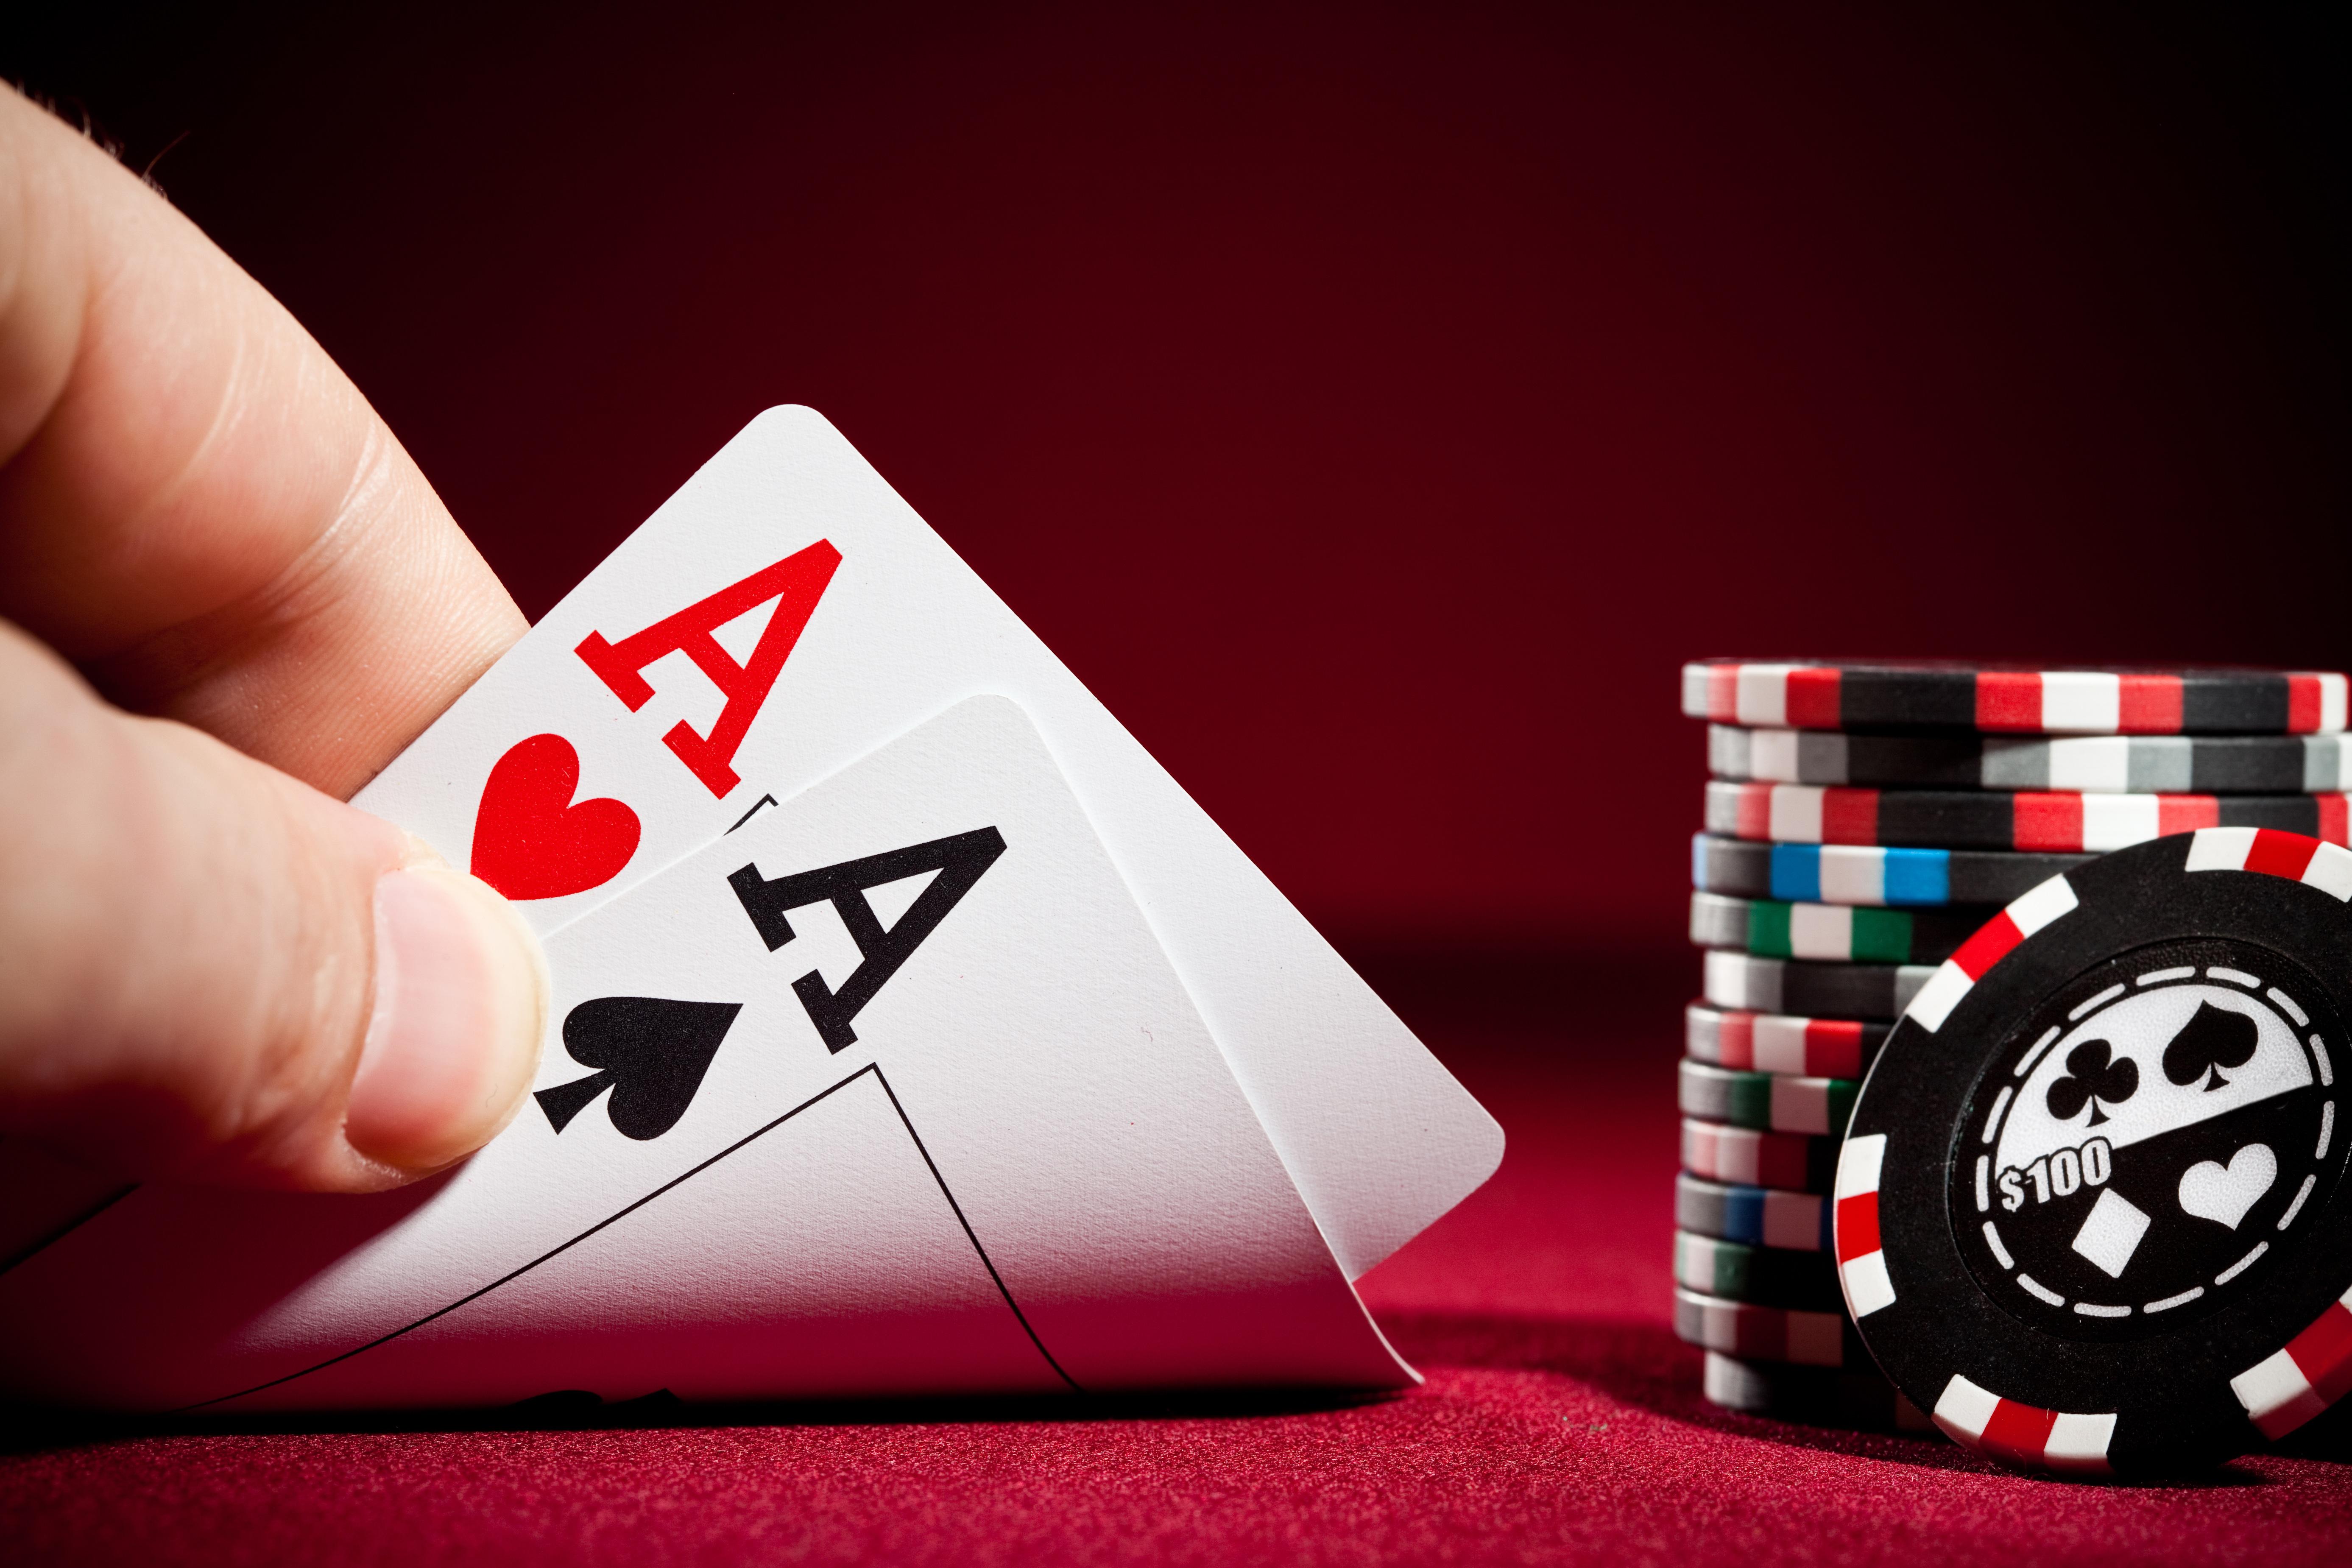 Gagner poker casino gambling history in florida